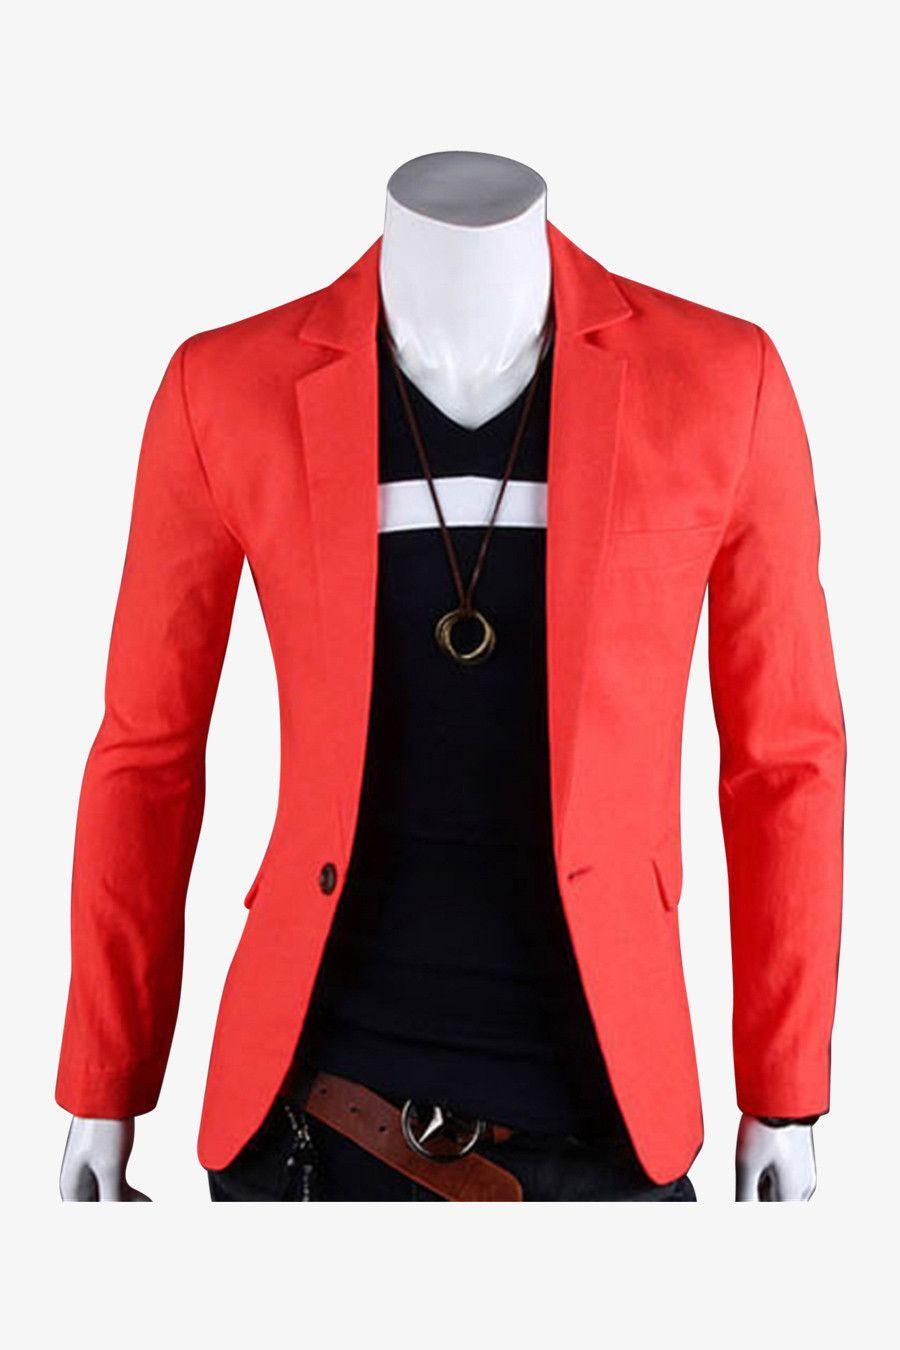 puma heroes t7 track ribbon red track jacket streetwear shop closer at  32fa5 50af5 - gkmint.com 64f7dcd71